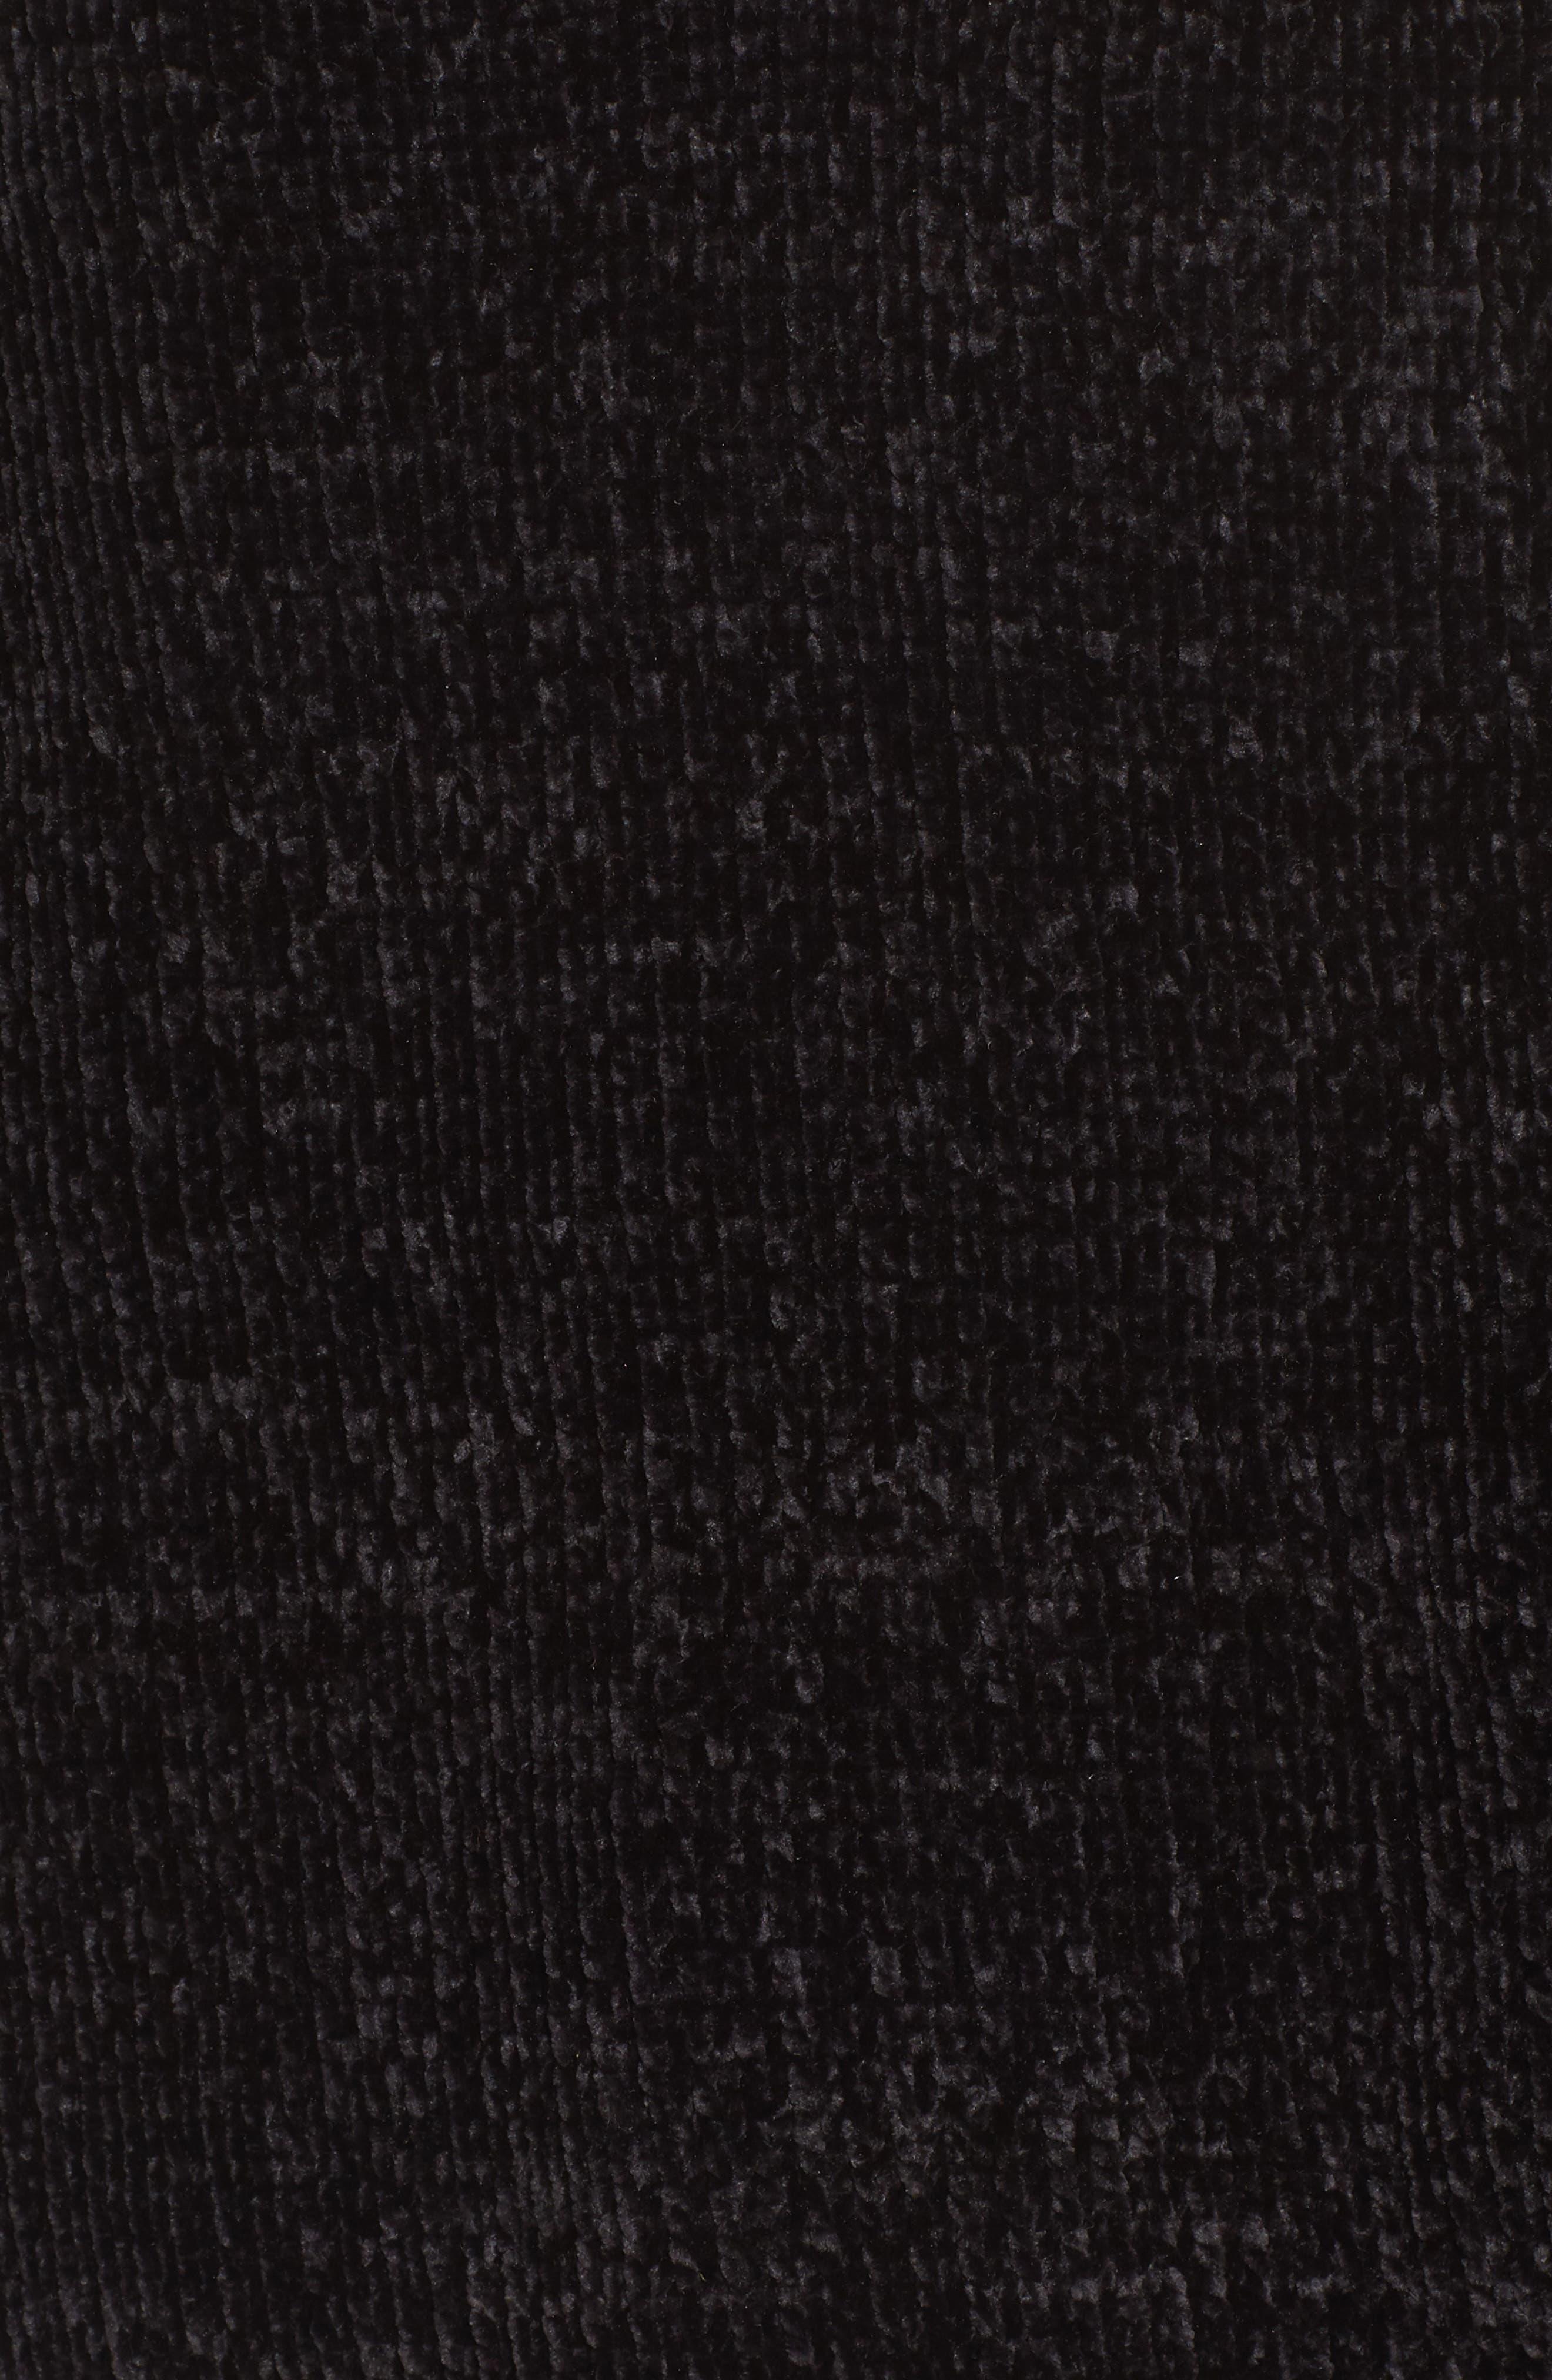 Chenille Choker Neck Sweater,                             Alternate thumbnail 5, color,                             Black